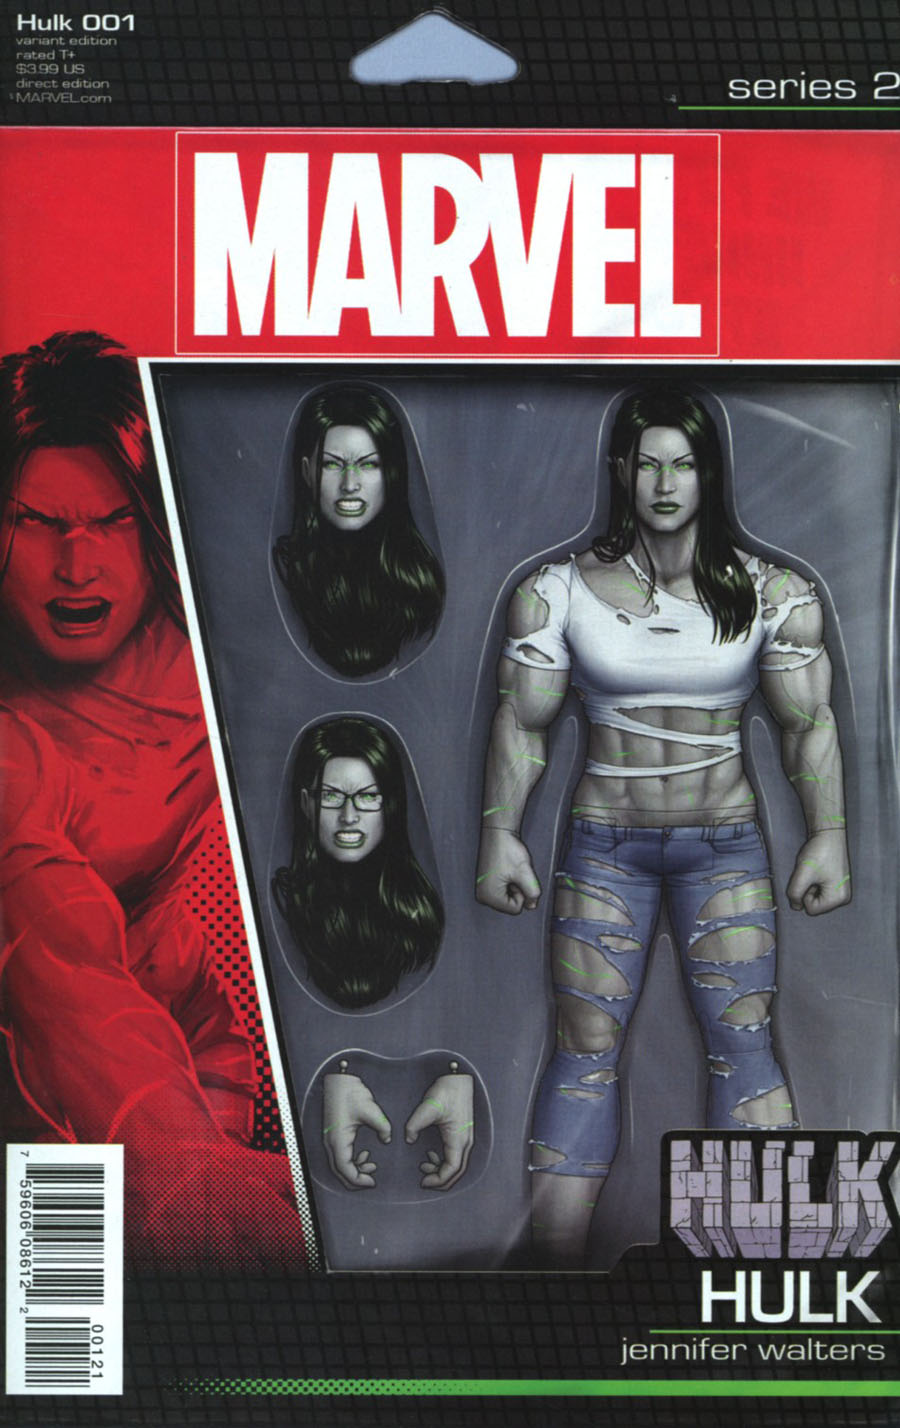 Hulk Vol 4 #1 Cover B Variant John Tyler Christopher Action Figure Cover (Marvel Now Tie-In)